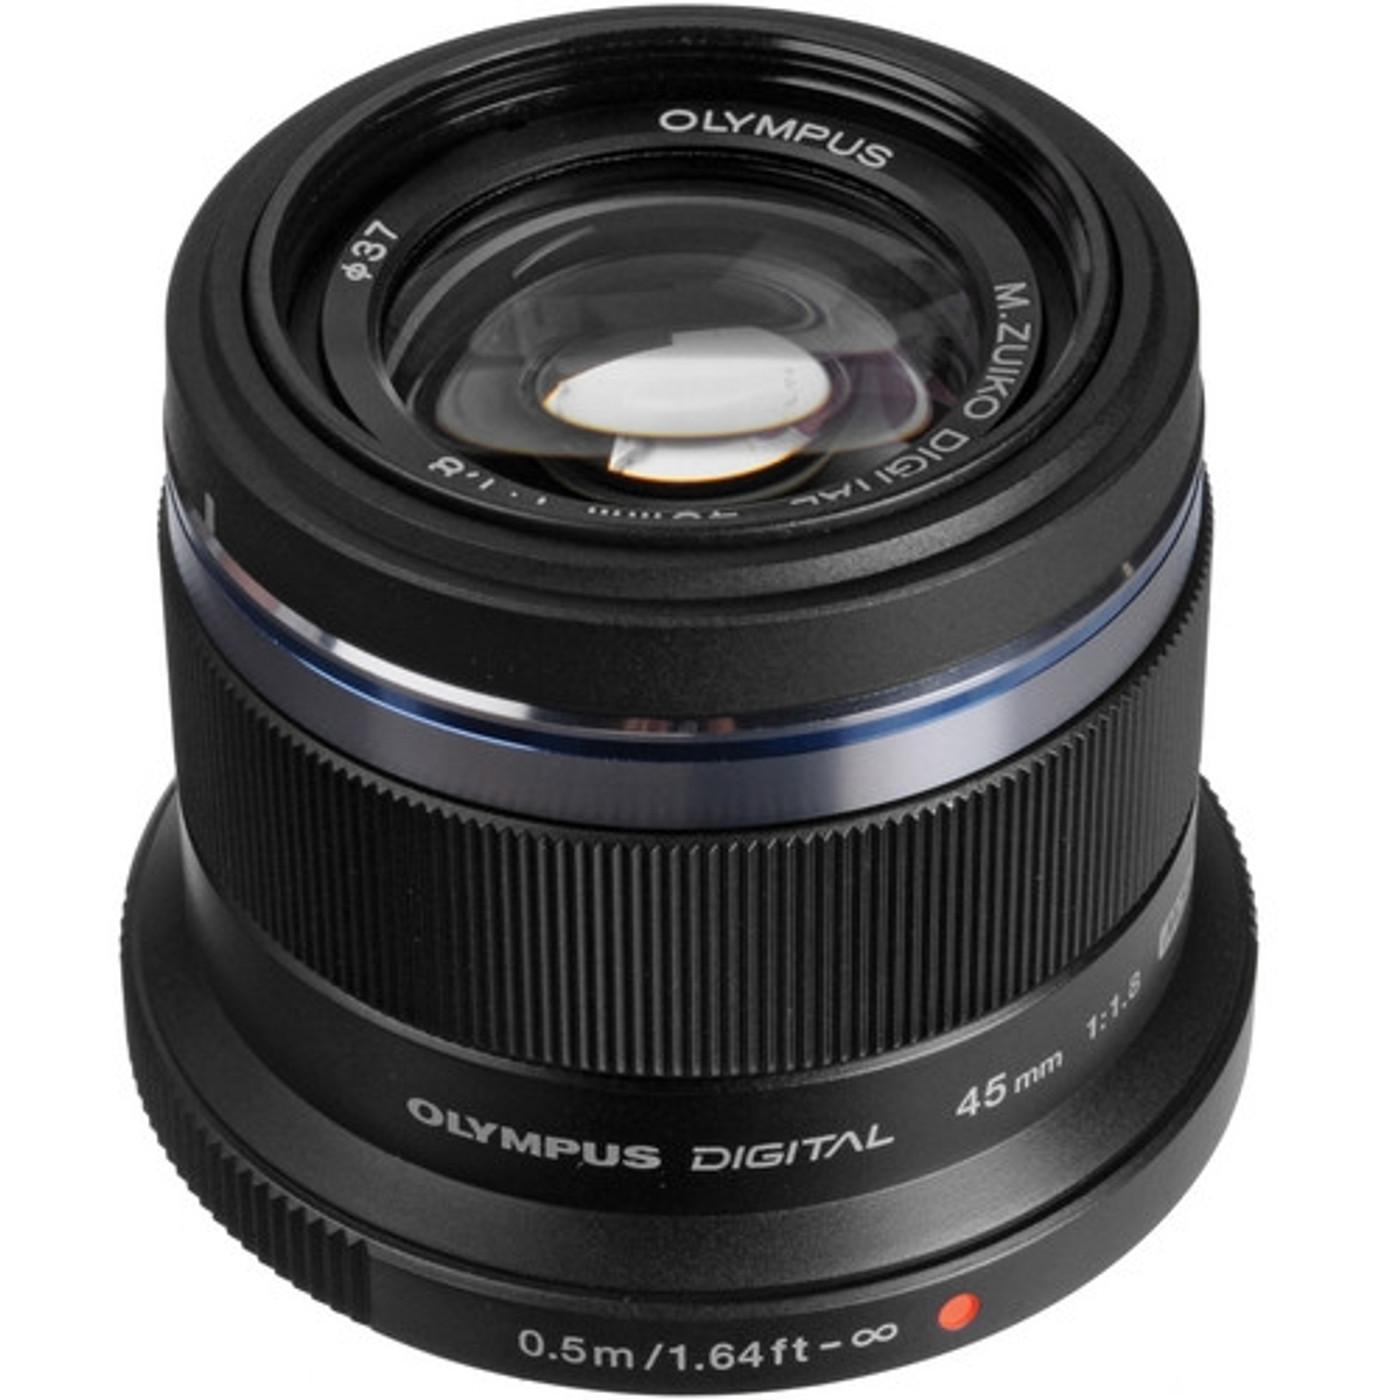 Olympus M.Zuiko Digital ED 45mm f1.8 Lens (Black)